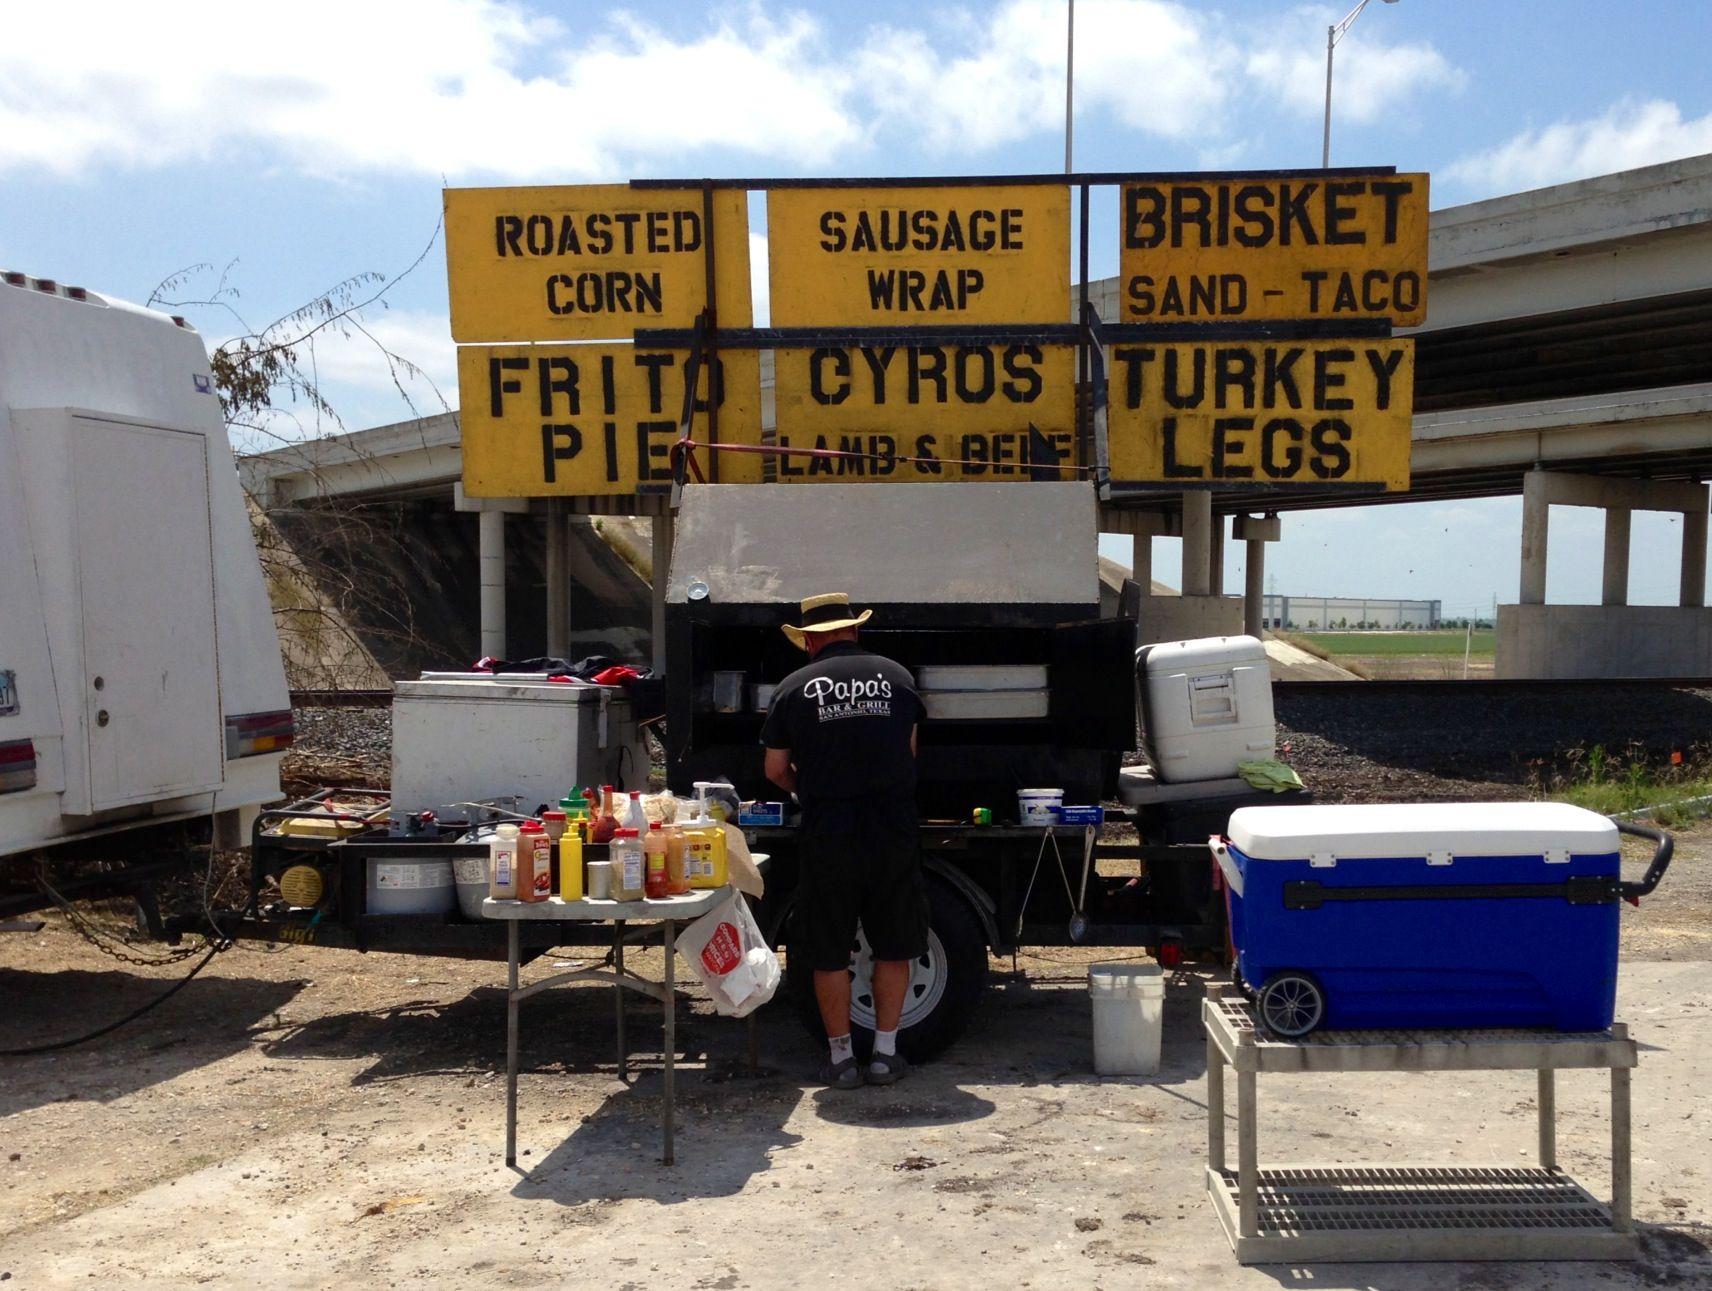 San Antonio S Best Kept Secret 410 South Take Old